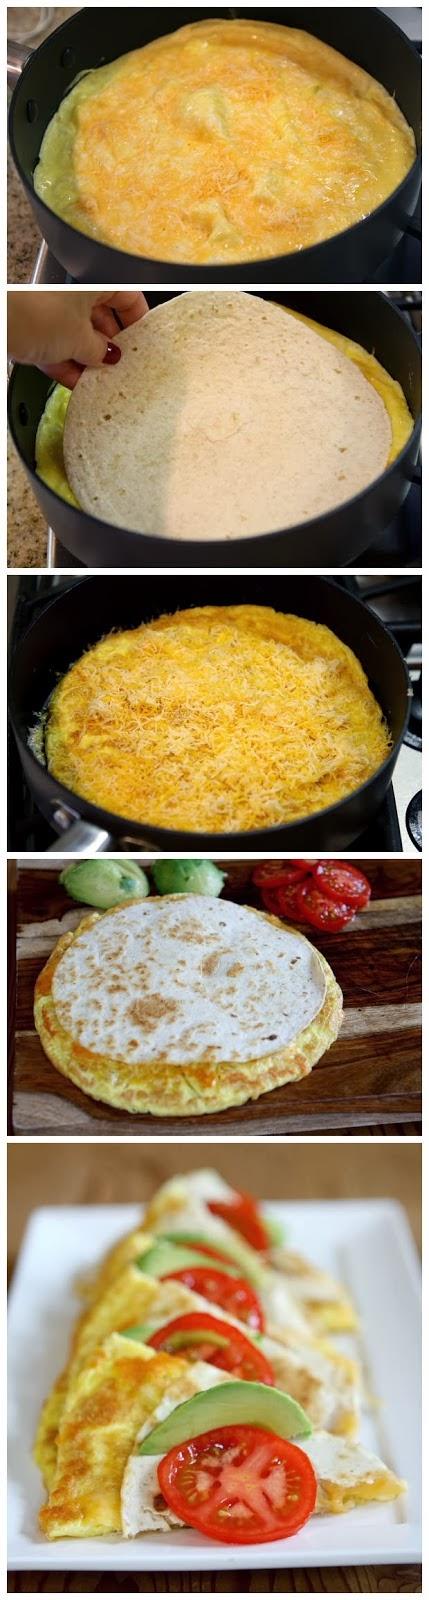 #Recipe : breakfast quesadillas